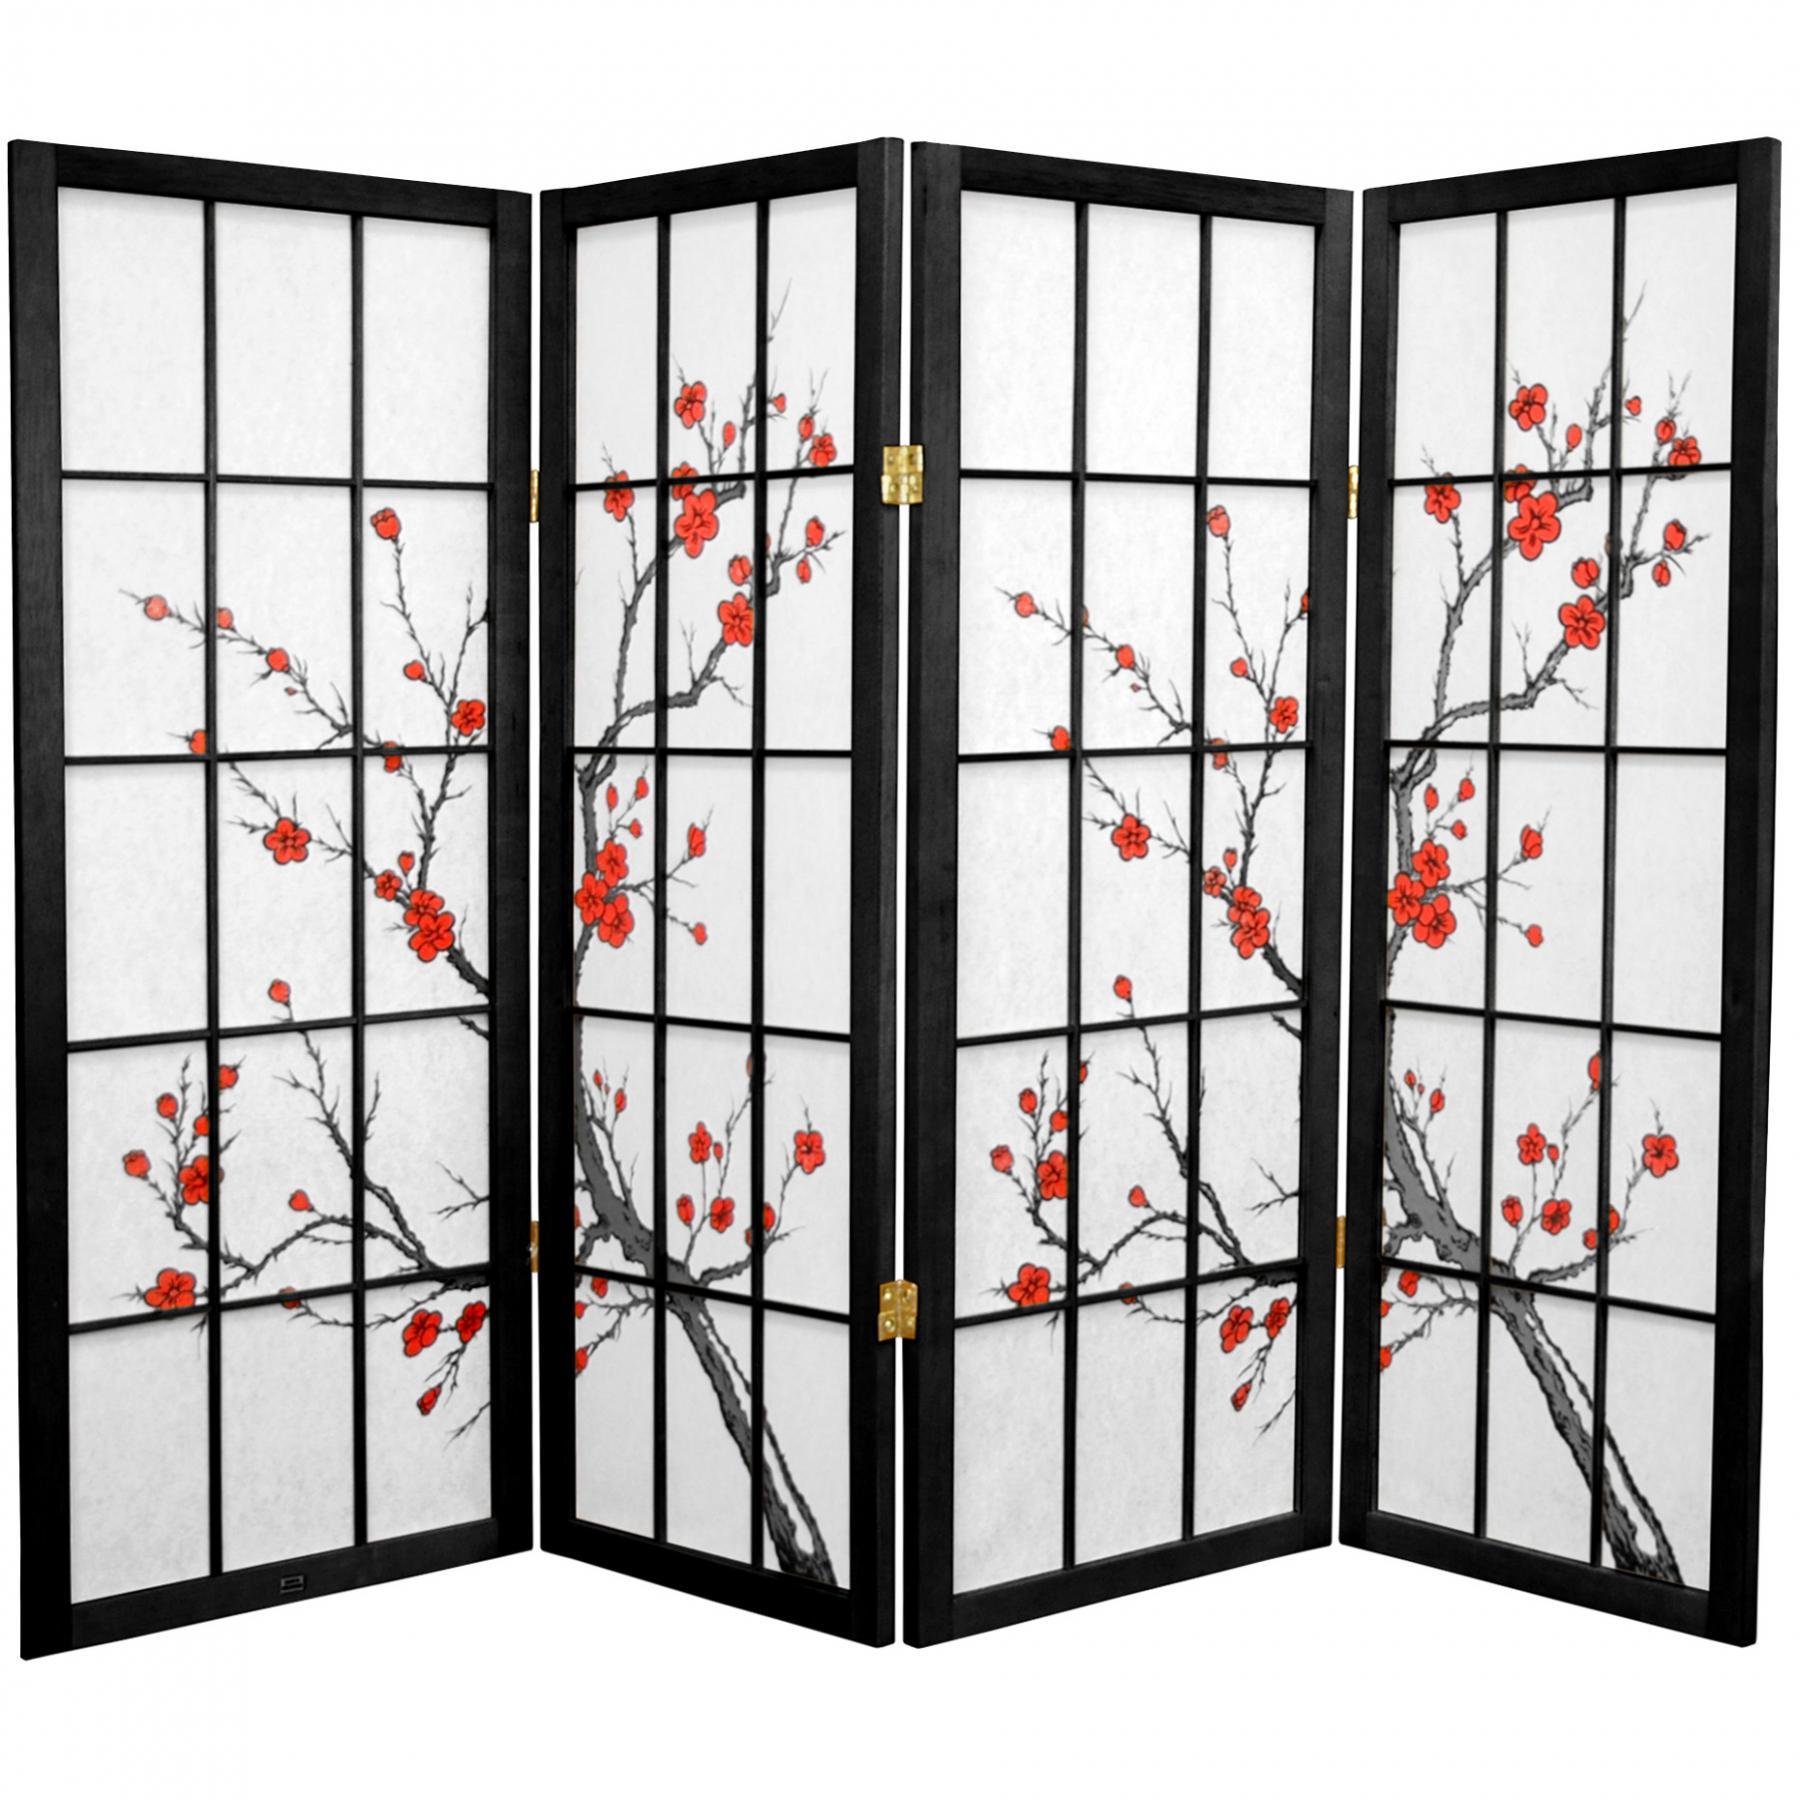 4 Ft Tall Cherry Blossom Shoji Screen